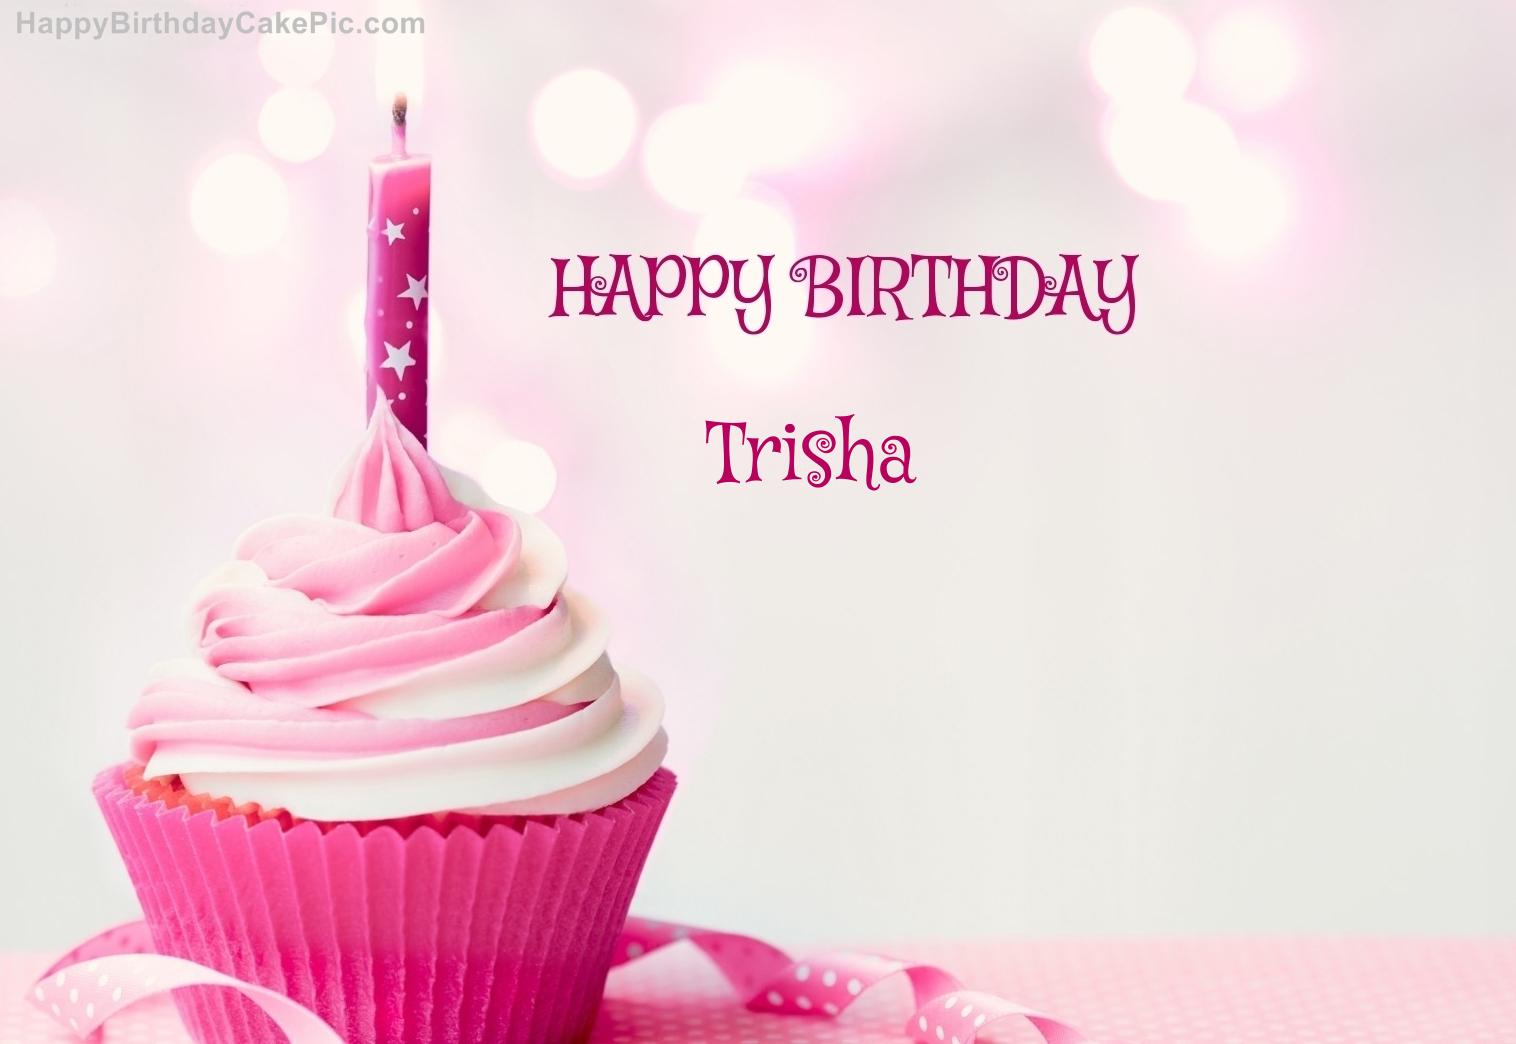 Happy Birthday Trisha Cake Images